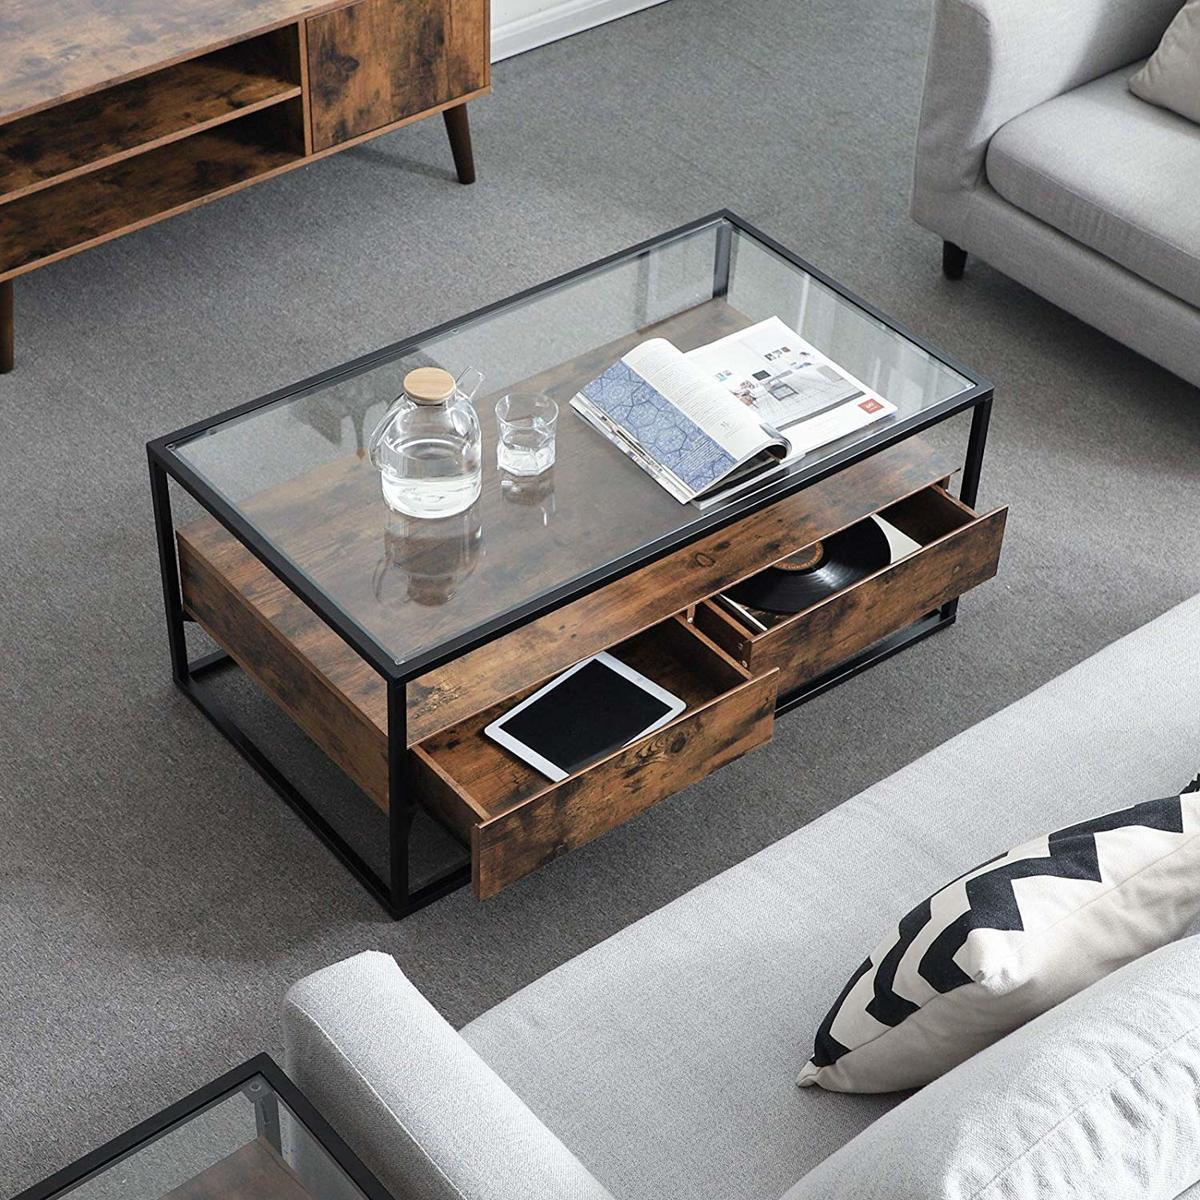 Design Salontafel Hout En Glas.Salontafel Met Strak Design Houten Koffie Tafel Met Gehard Glas En Twee Rustieke Lades 106 Cm Lang